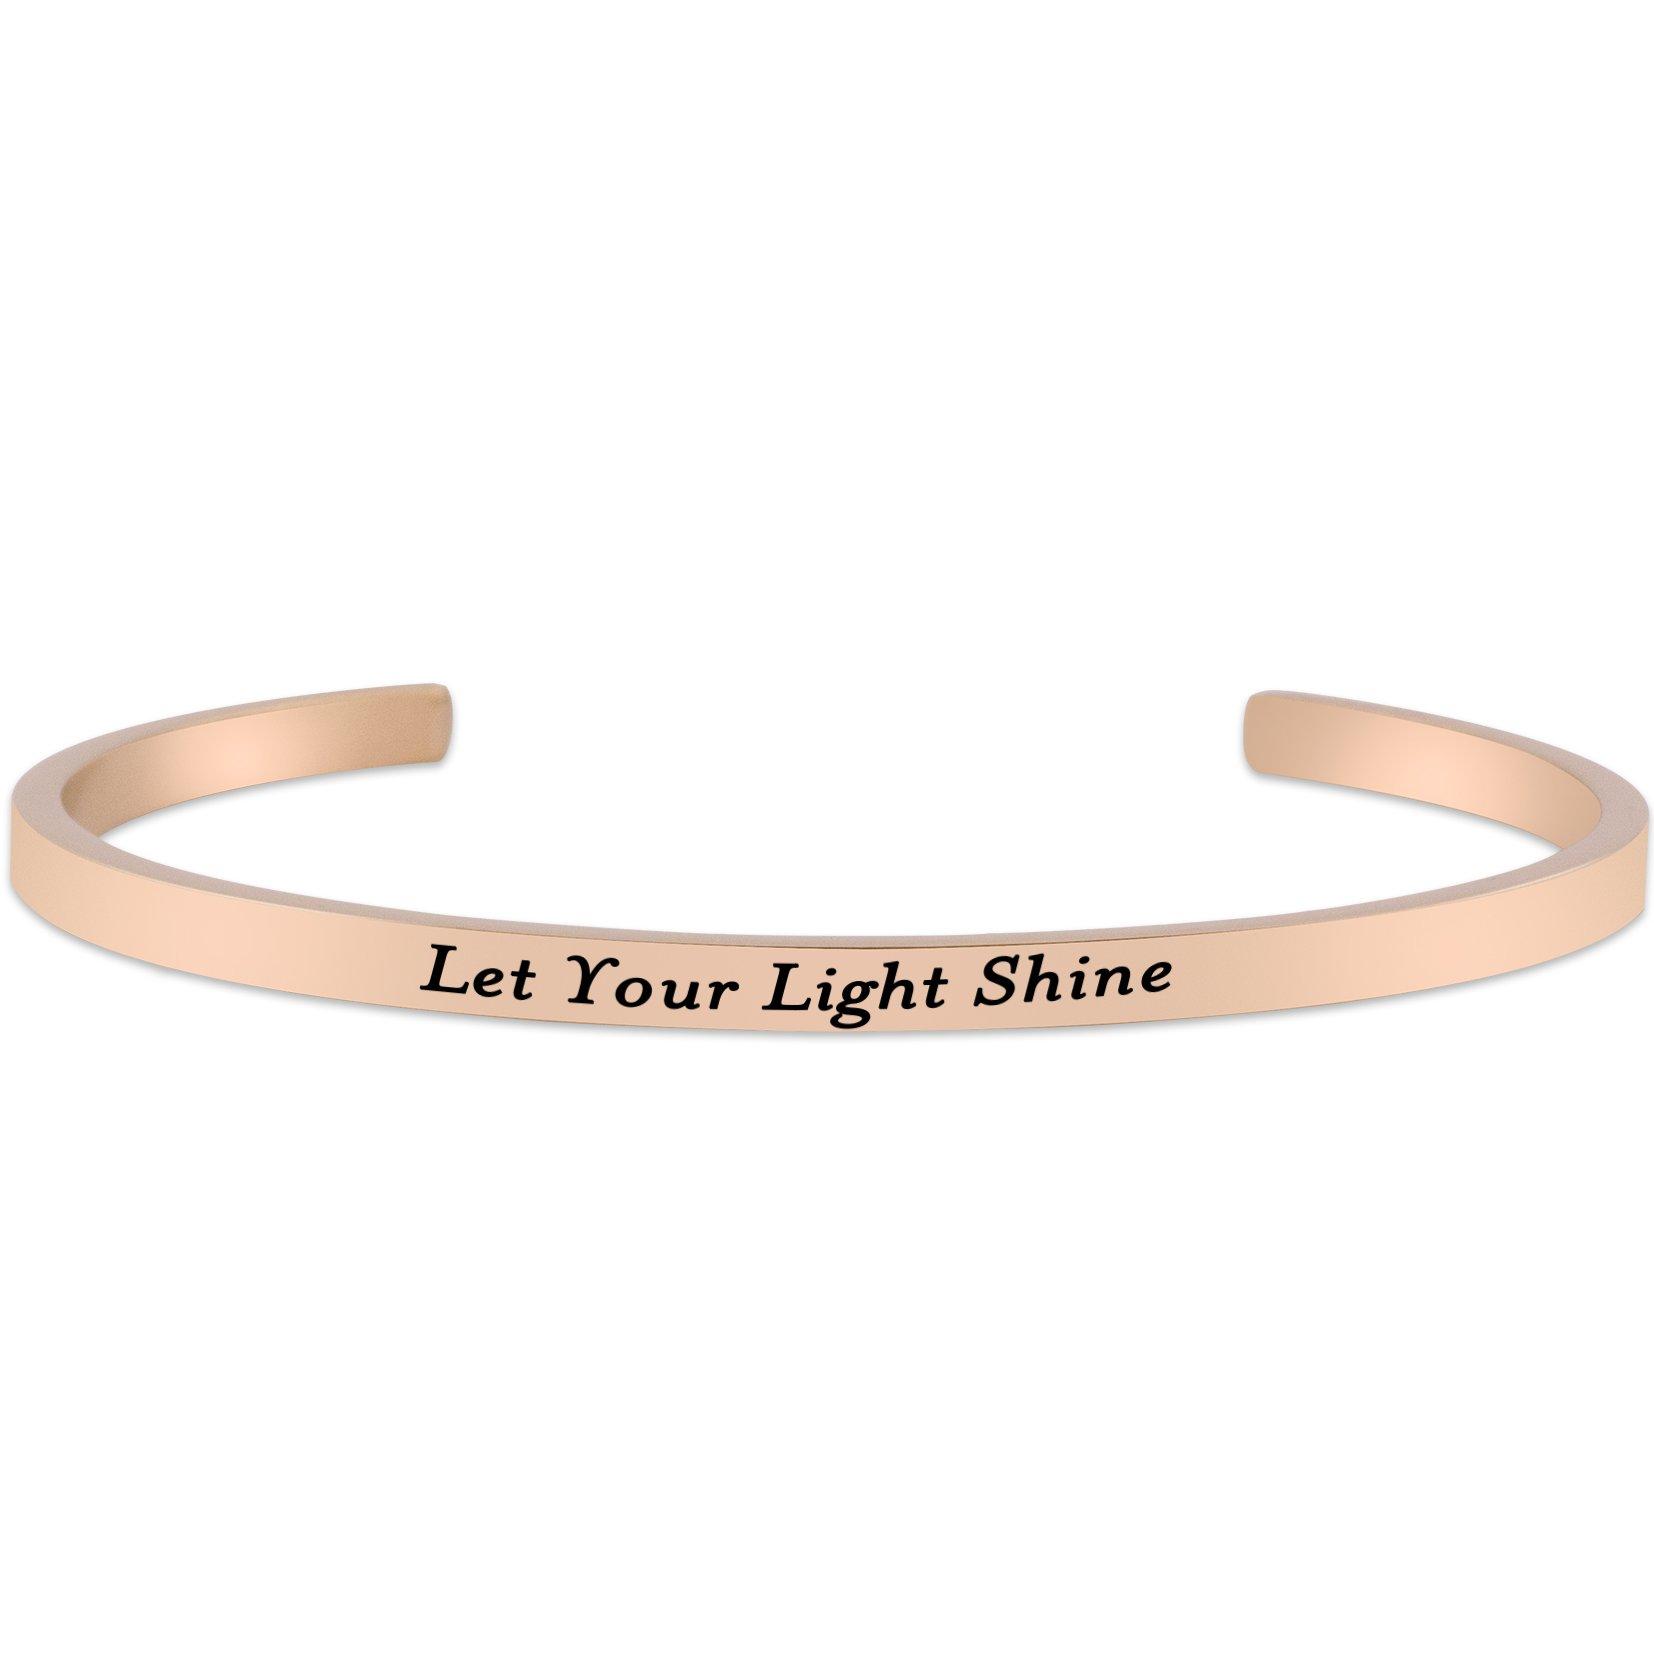 Lademayh Let Your Light Shine Engraved Friendship Bracelet Stainless Steel Inspirational Mantra Bracelets for Sister, Rose Gold Personalized Bracelets Jewelry